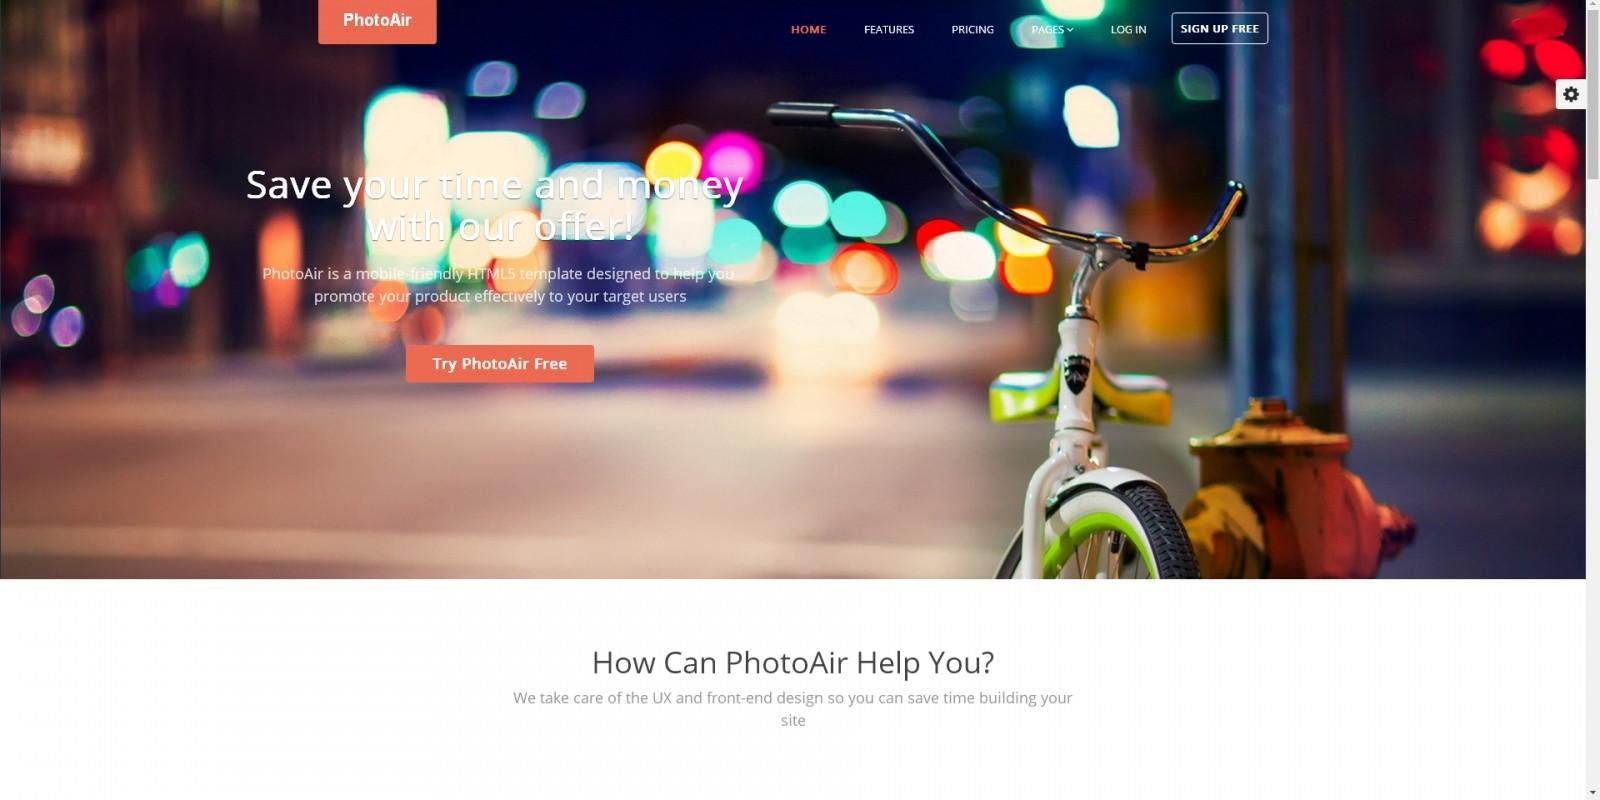 Photoair App Presentation Html Template Codester